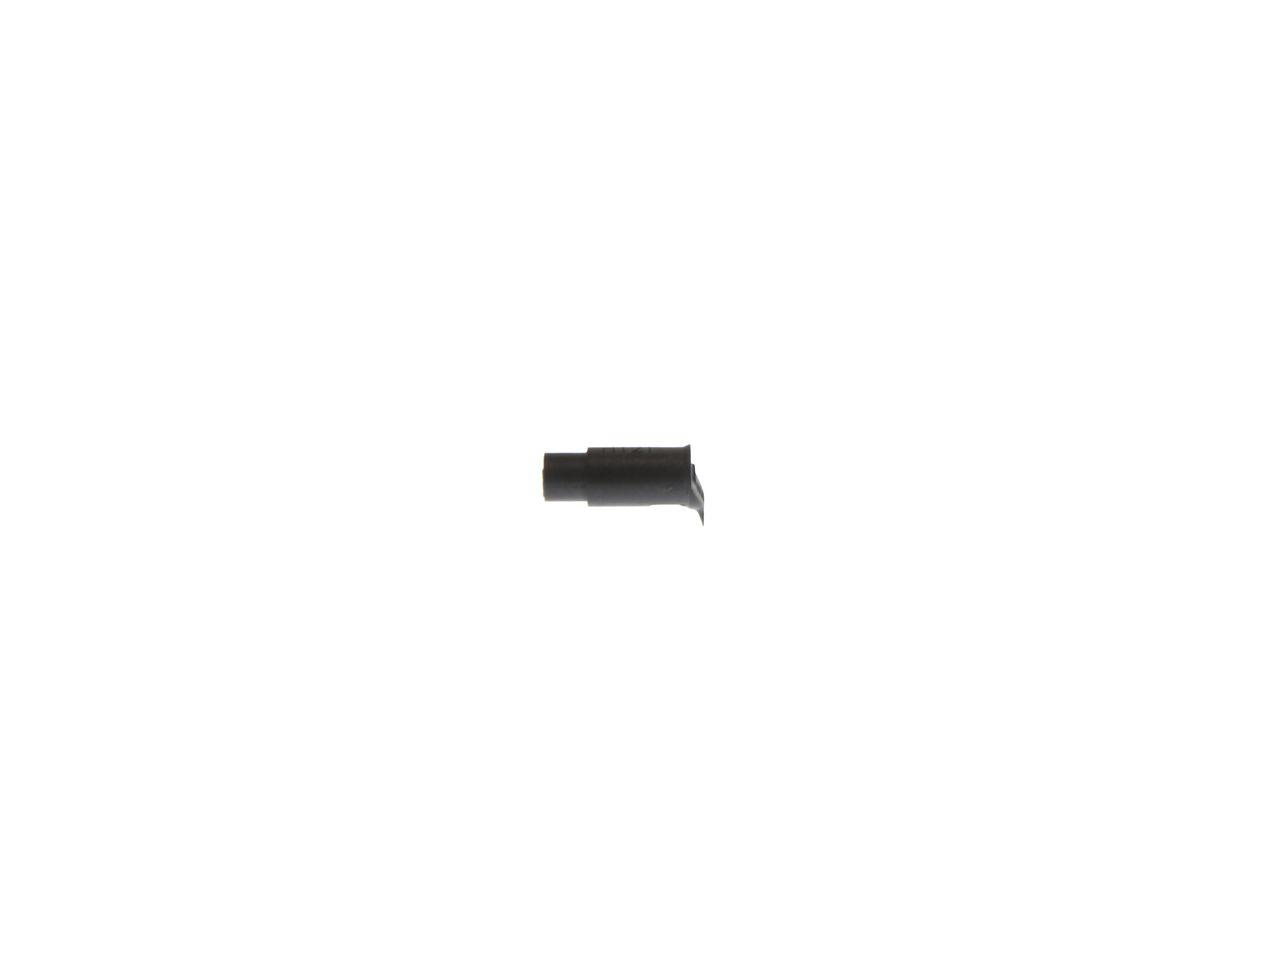 Umarex HK VP9パーツ/01-14 ムービングバルブ  [VGCCLR010]